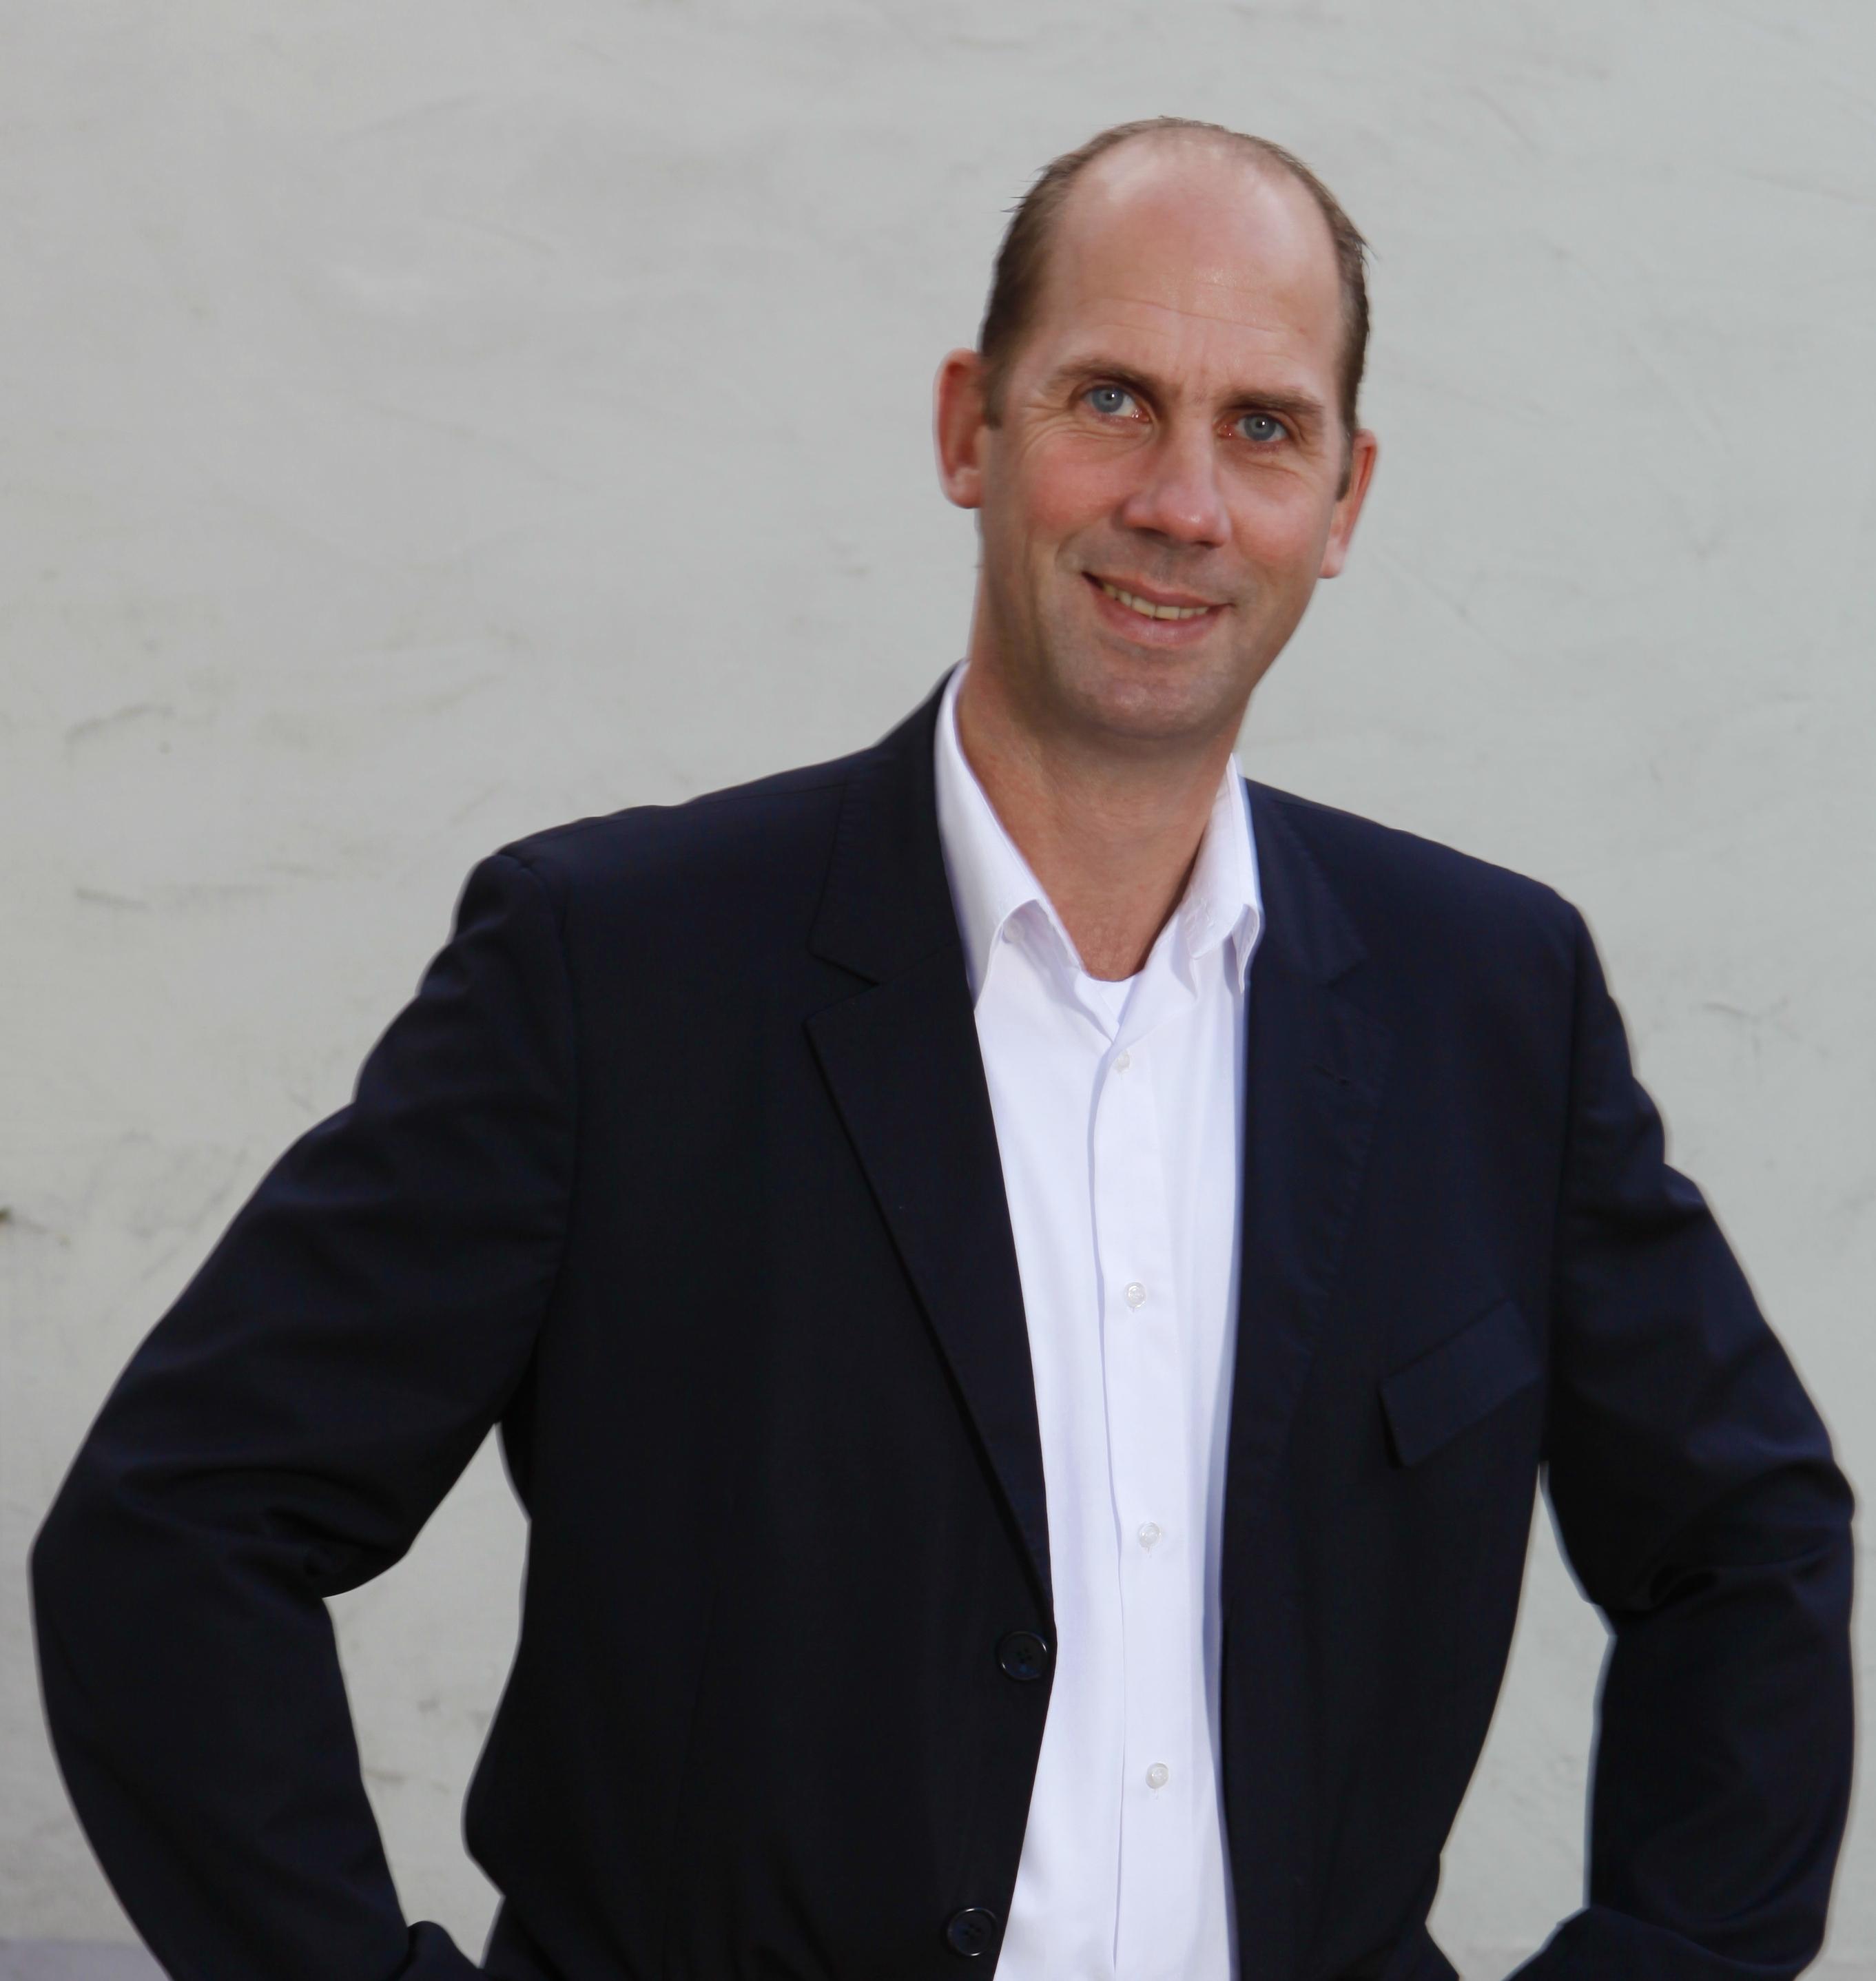 Björn Seidel